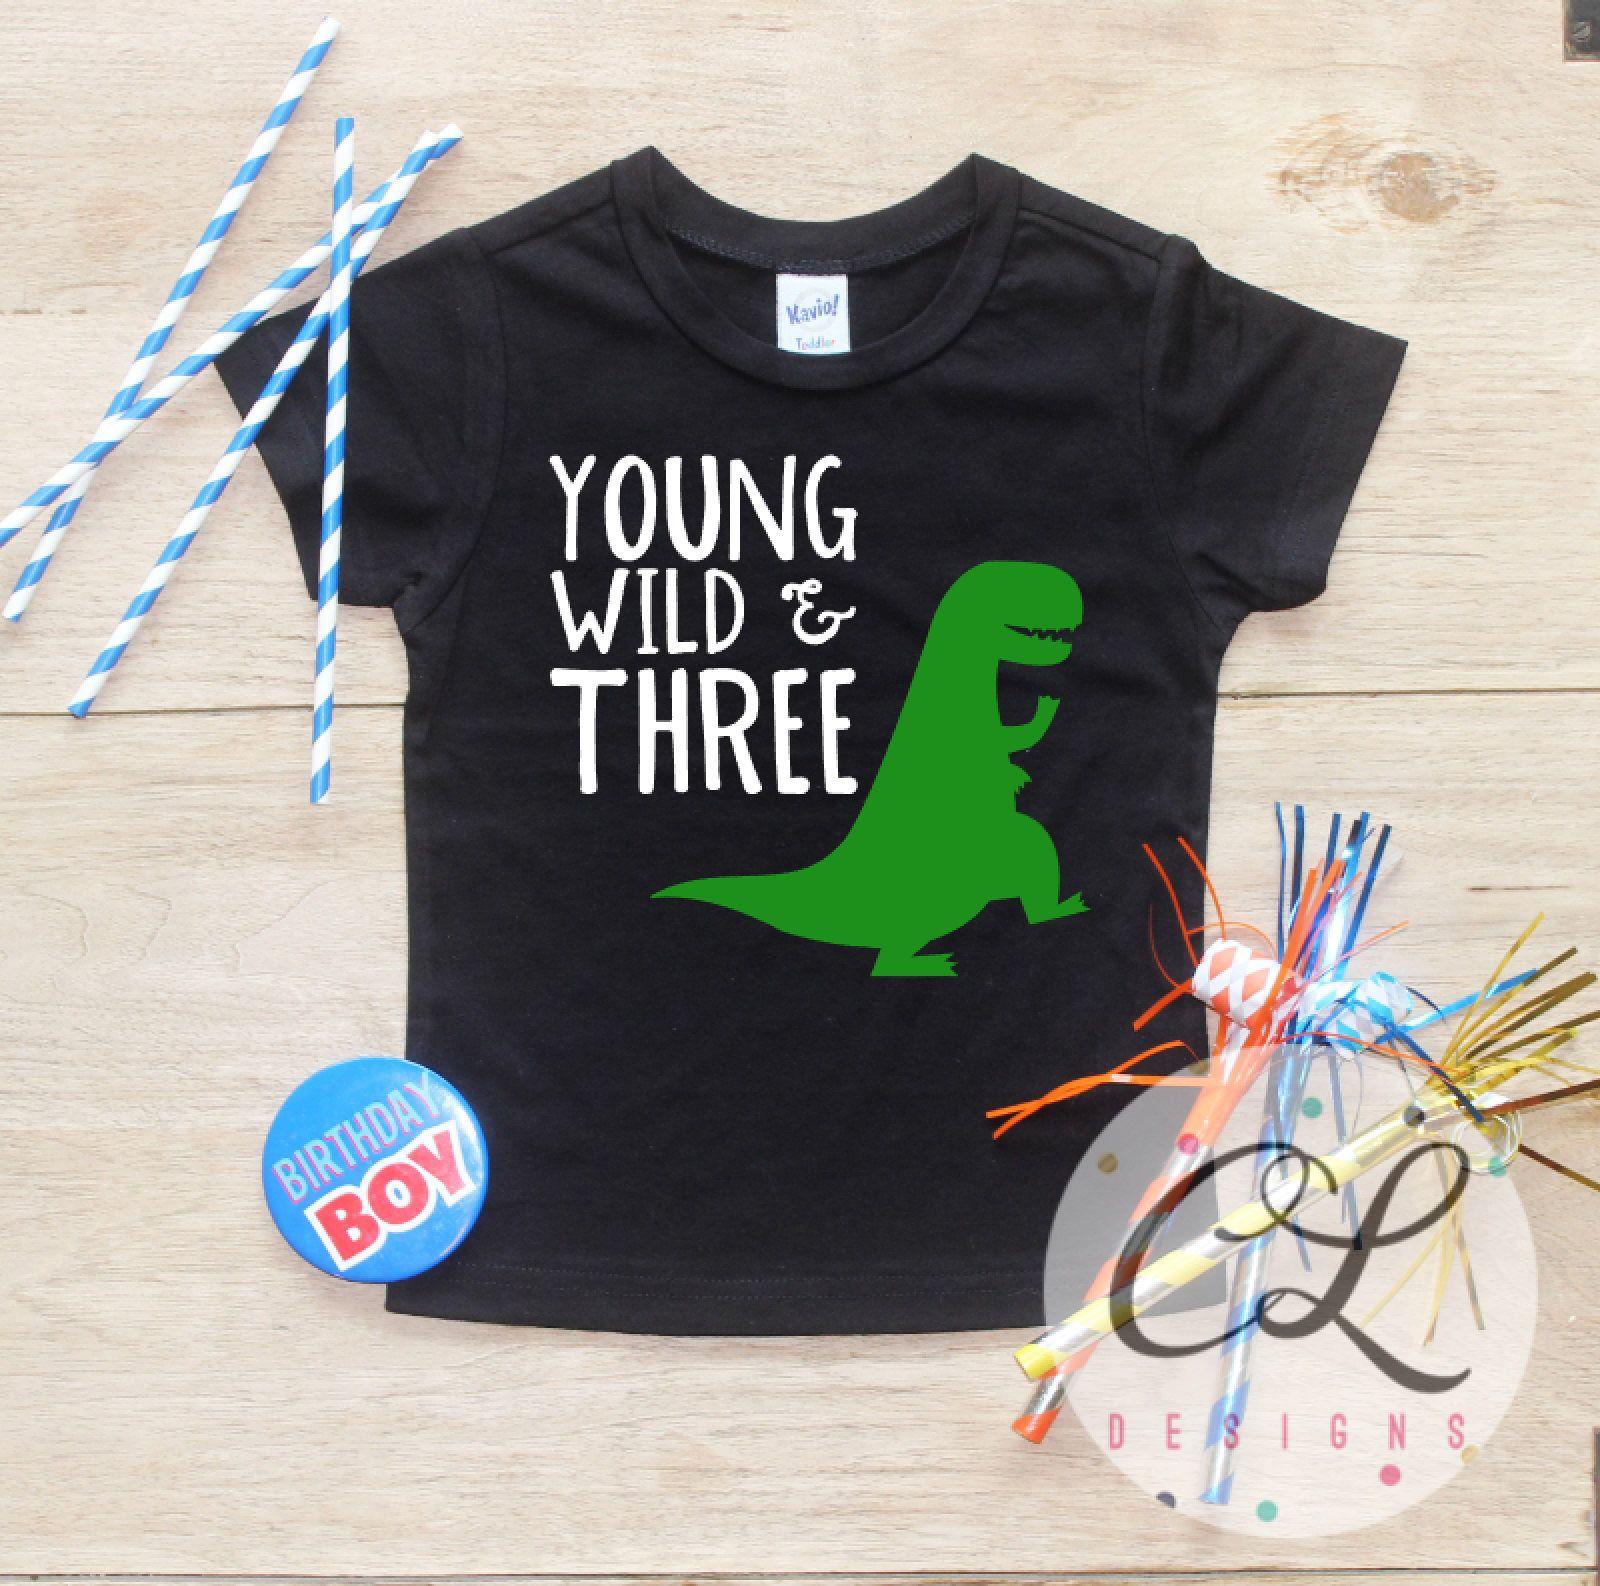 Dinosaur birthday shirts Three year old birthday shirts boy Boy birthday outfit 3rd birthday outfit boy Third Birthday dinosaur shirts